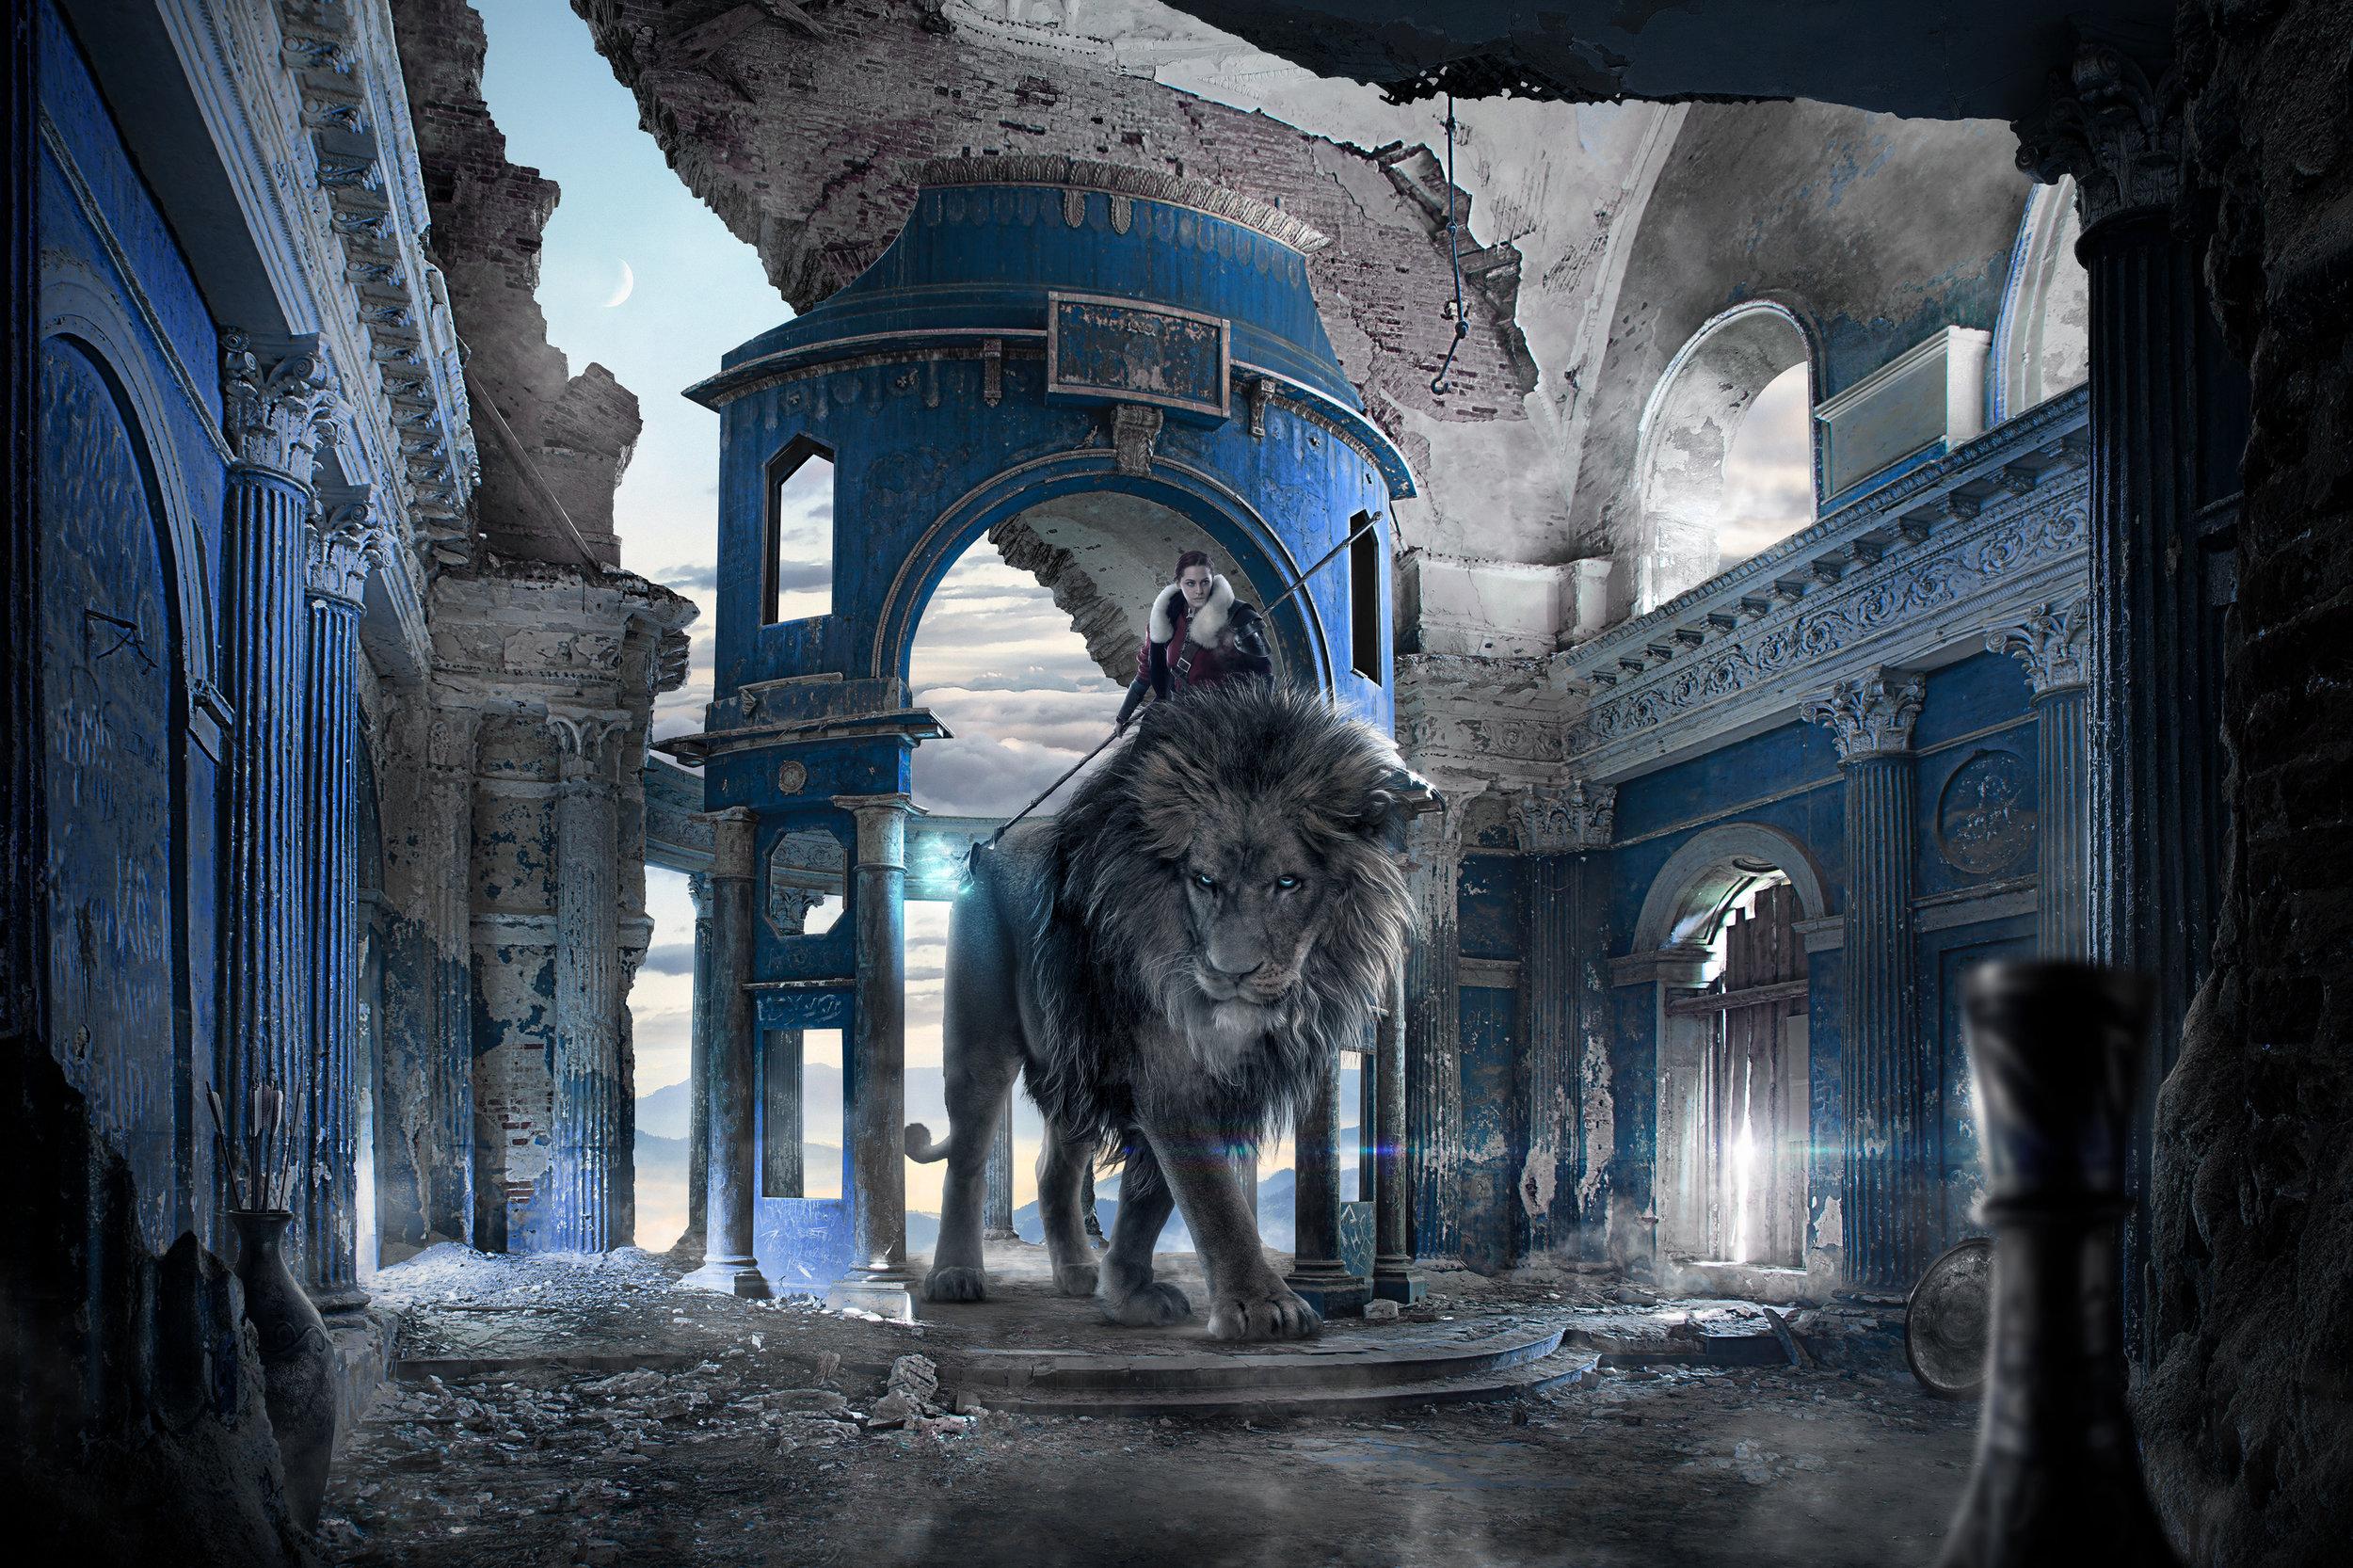 Aska & the Lion